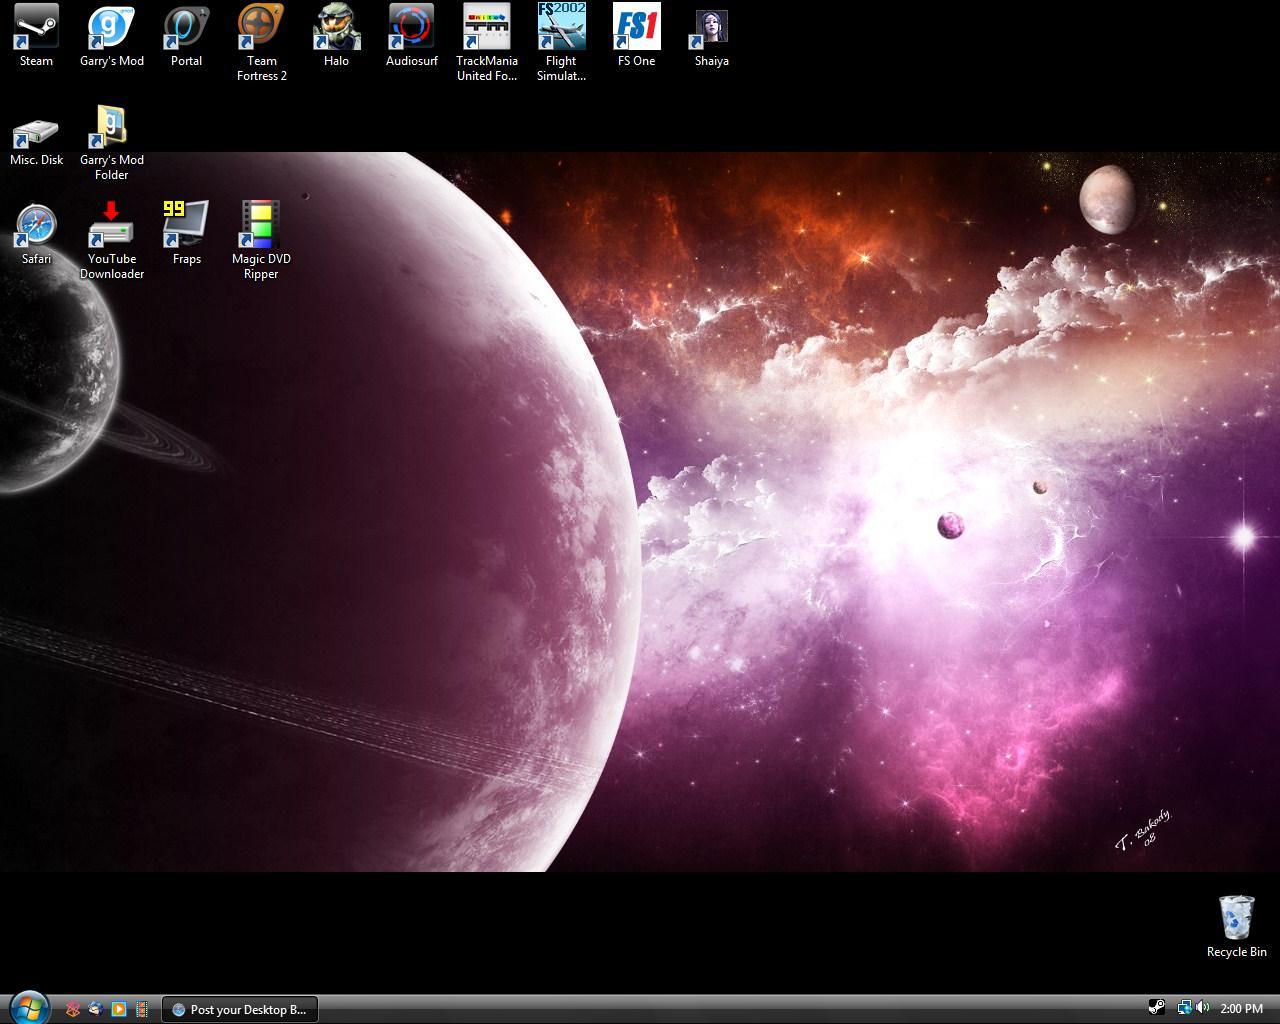 how to set wallpaper on your desktop 1280x1024